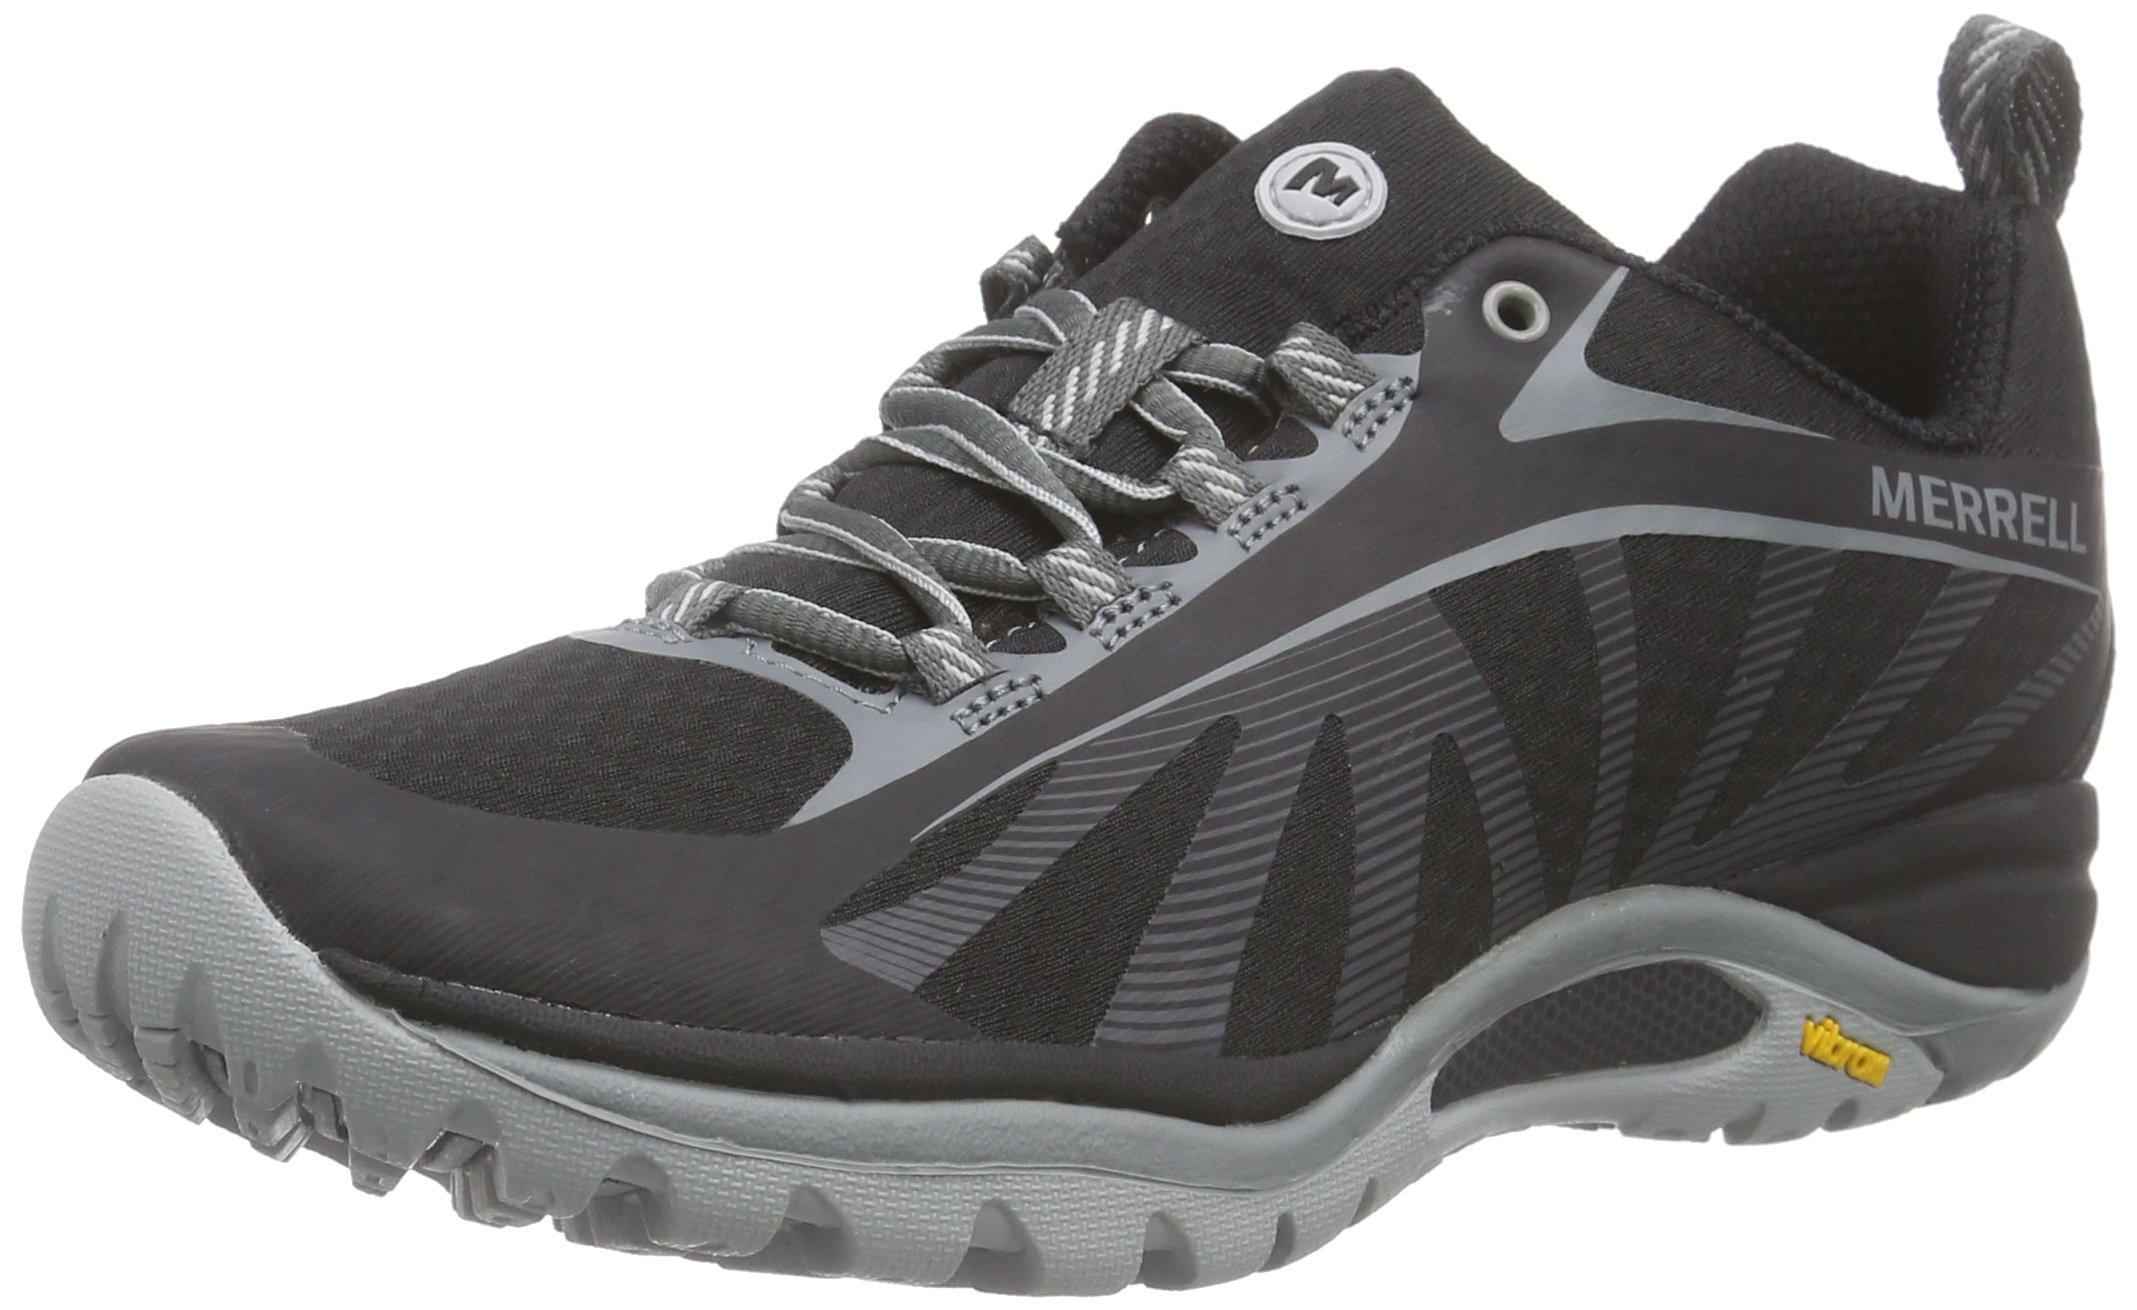 Merrell Women's Siren Edge Hiking Shoe, Black, 9 M US